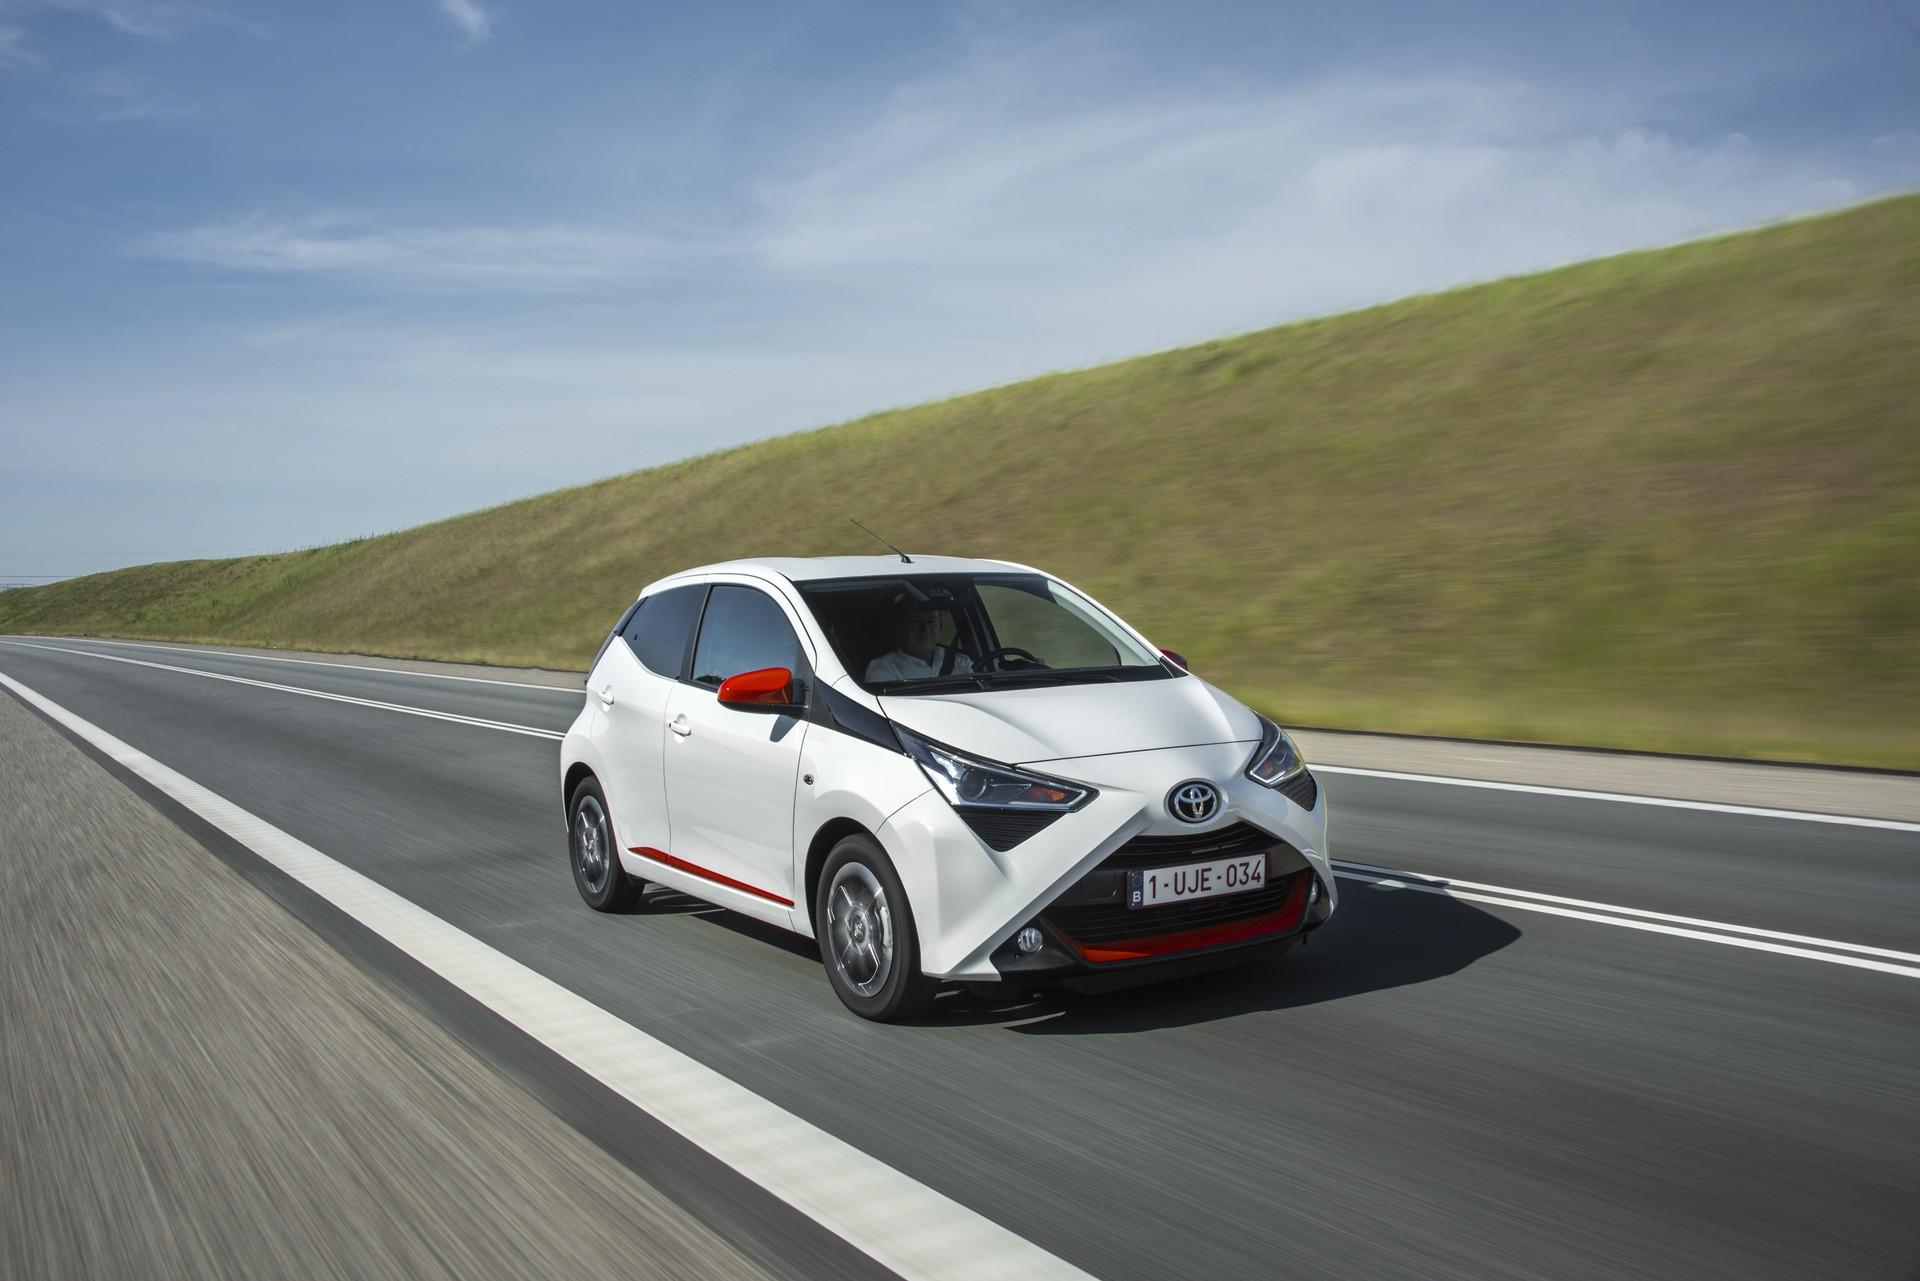 Toyota_Aygo_facelift_presskit_0057